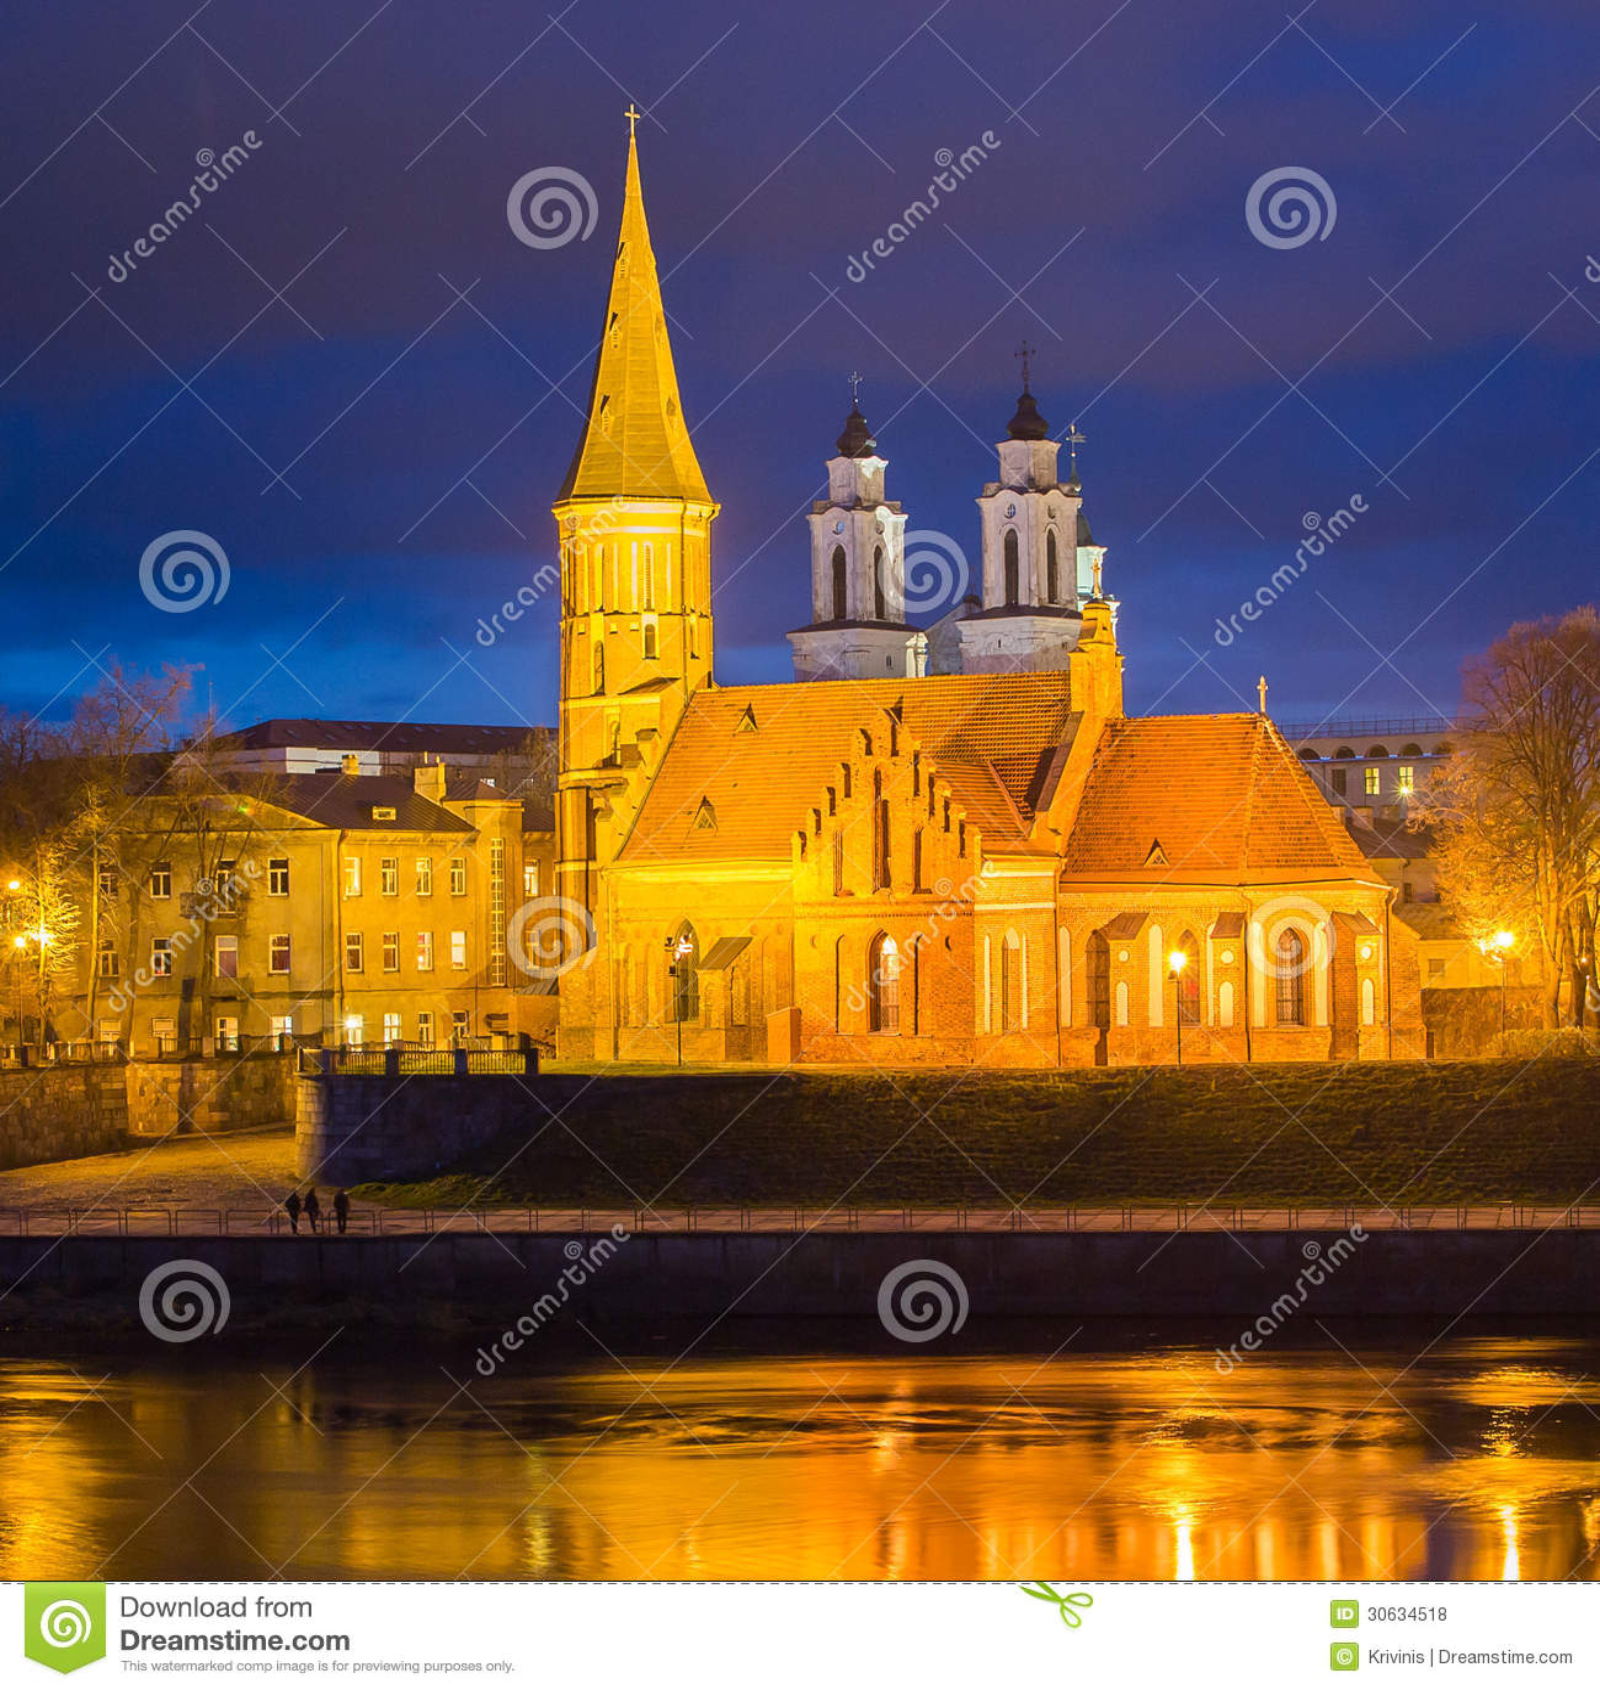 Vytautas the Great Church in Kaunas, Lithuania